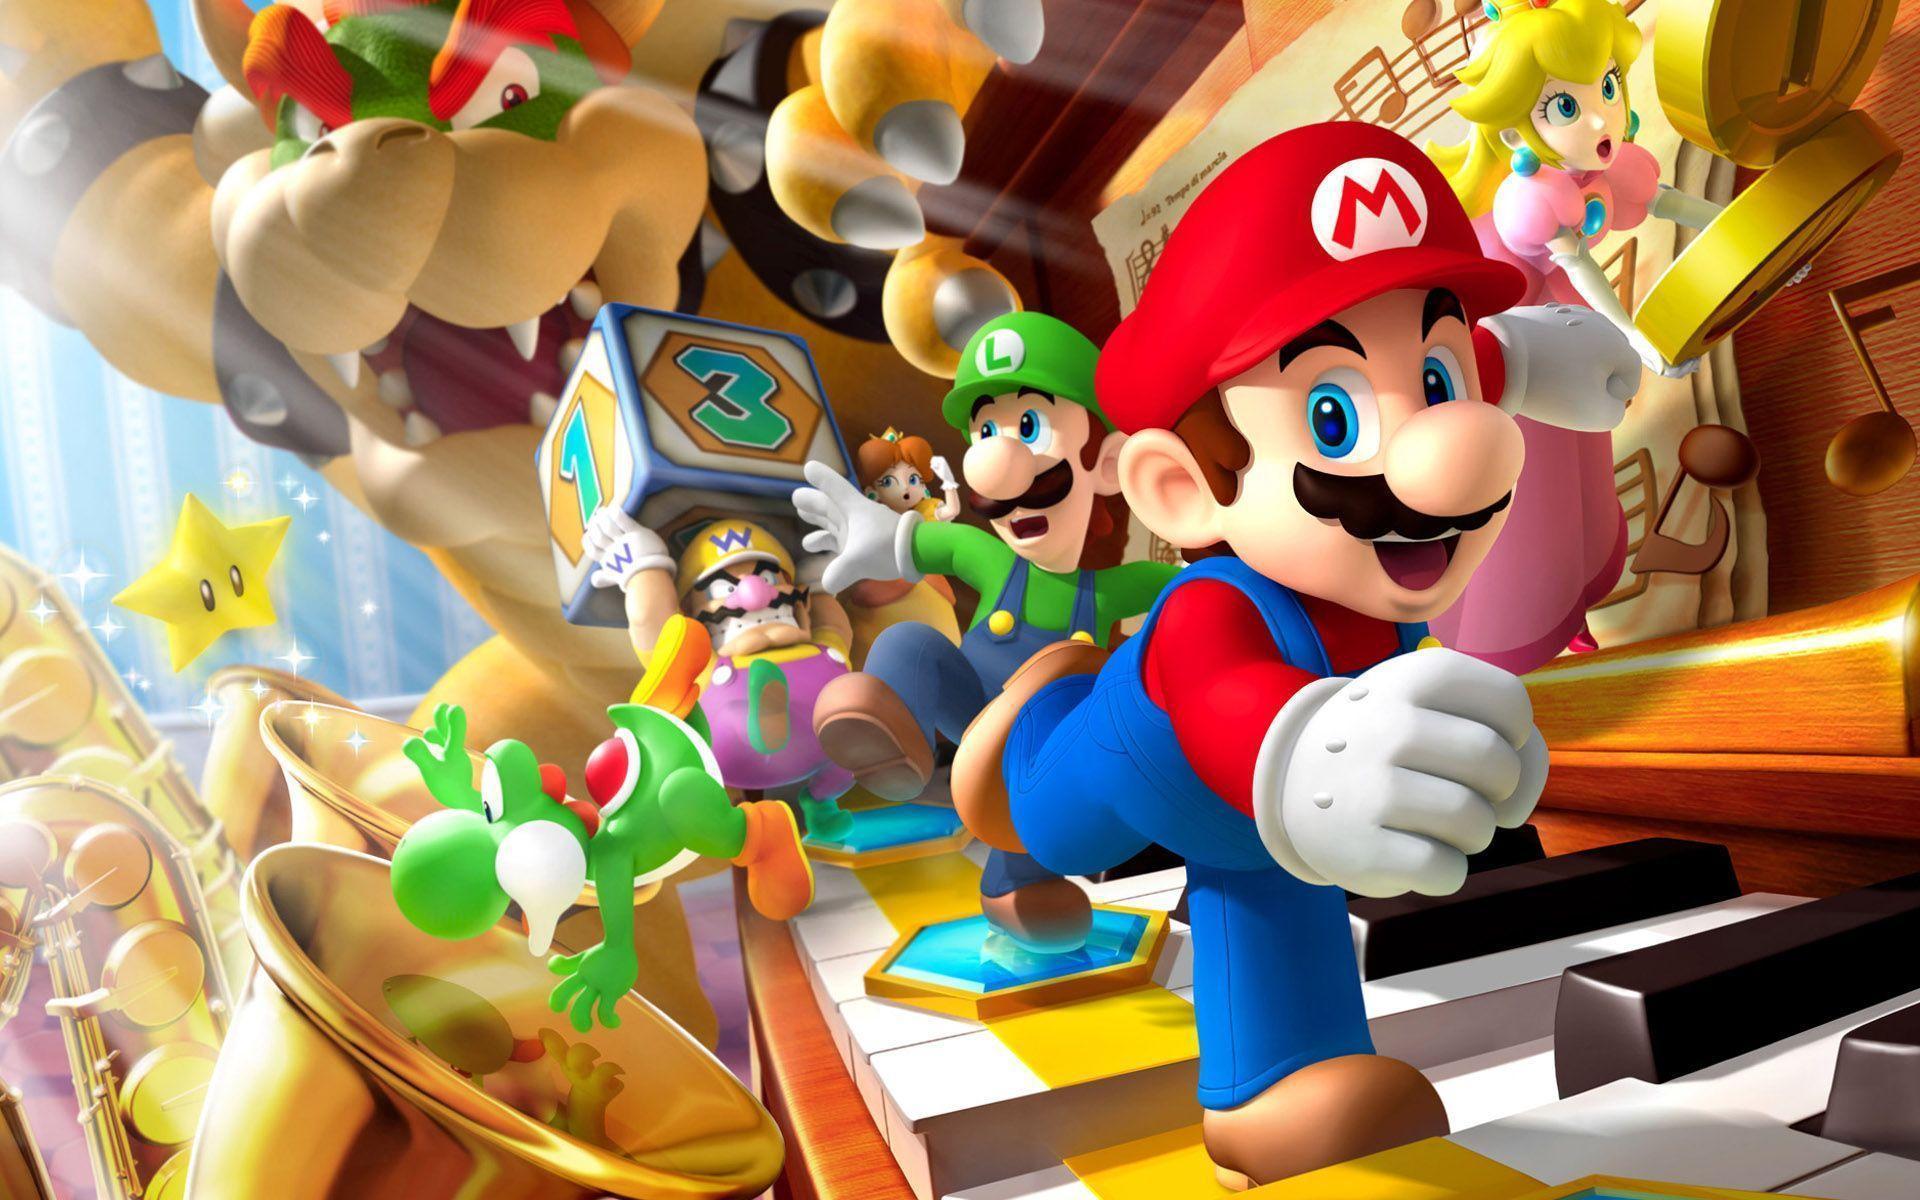 Super Mario Wallpaper – Creativity at Its Best!